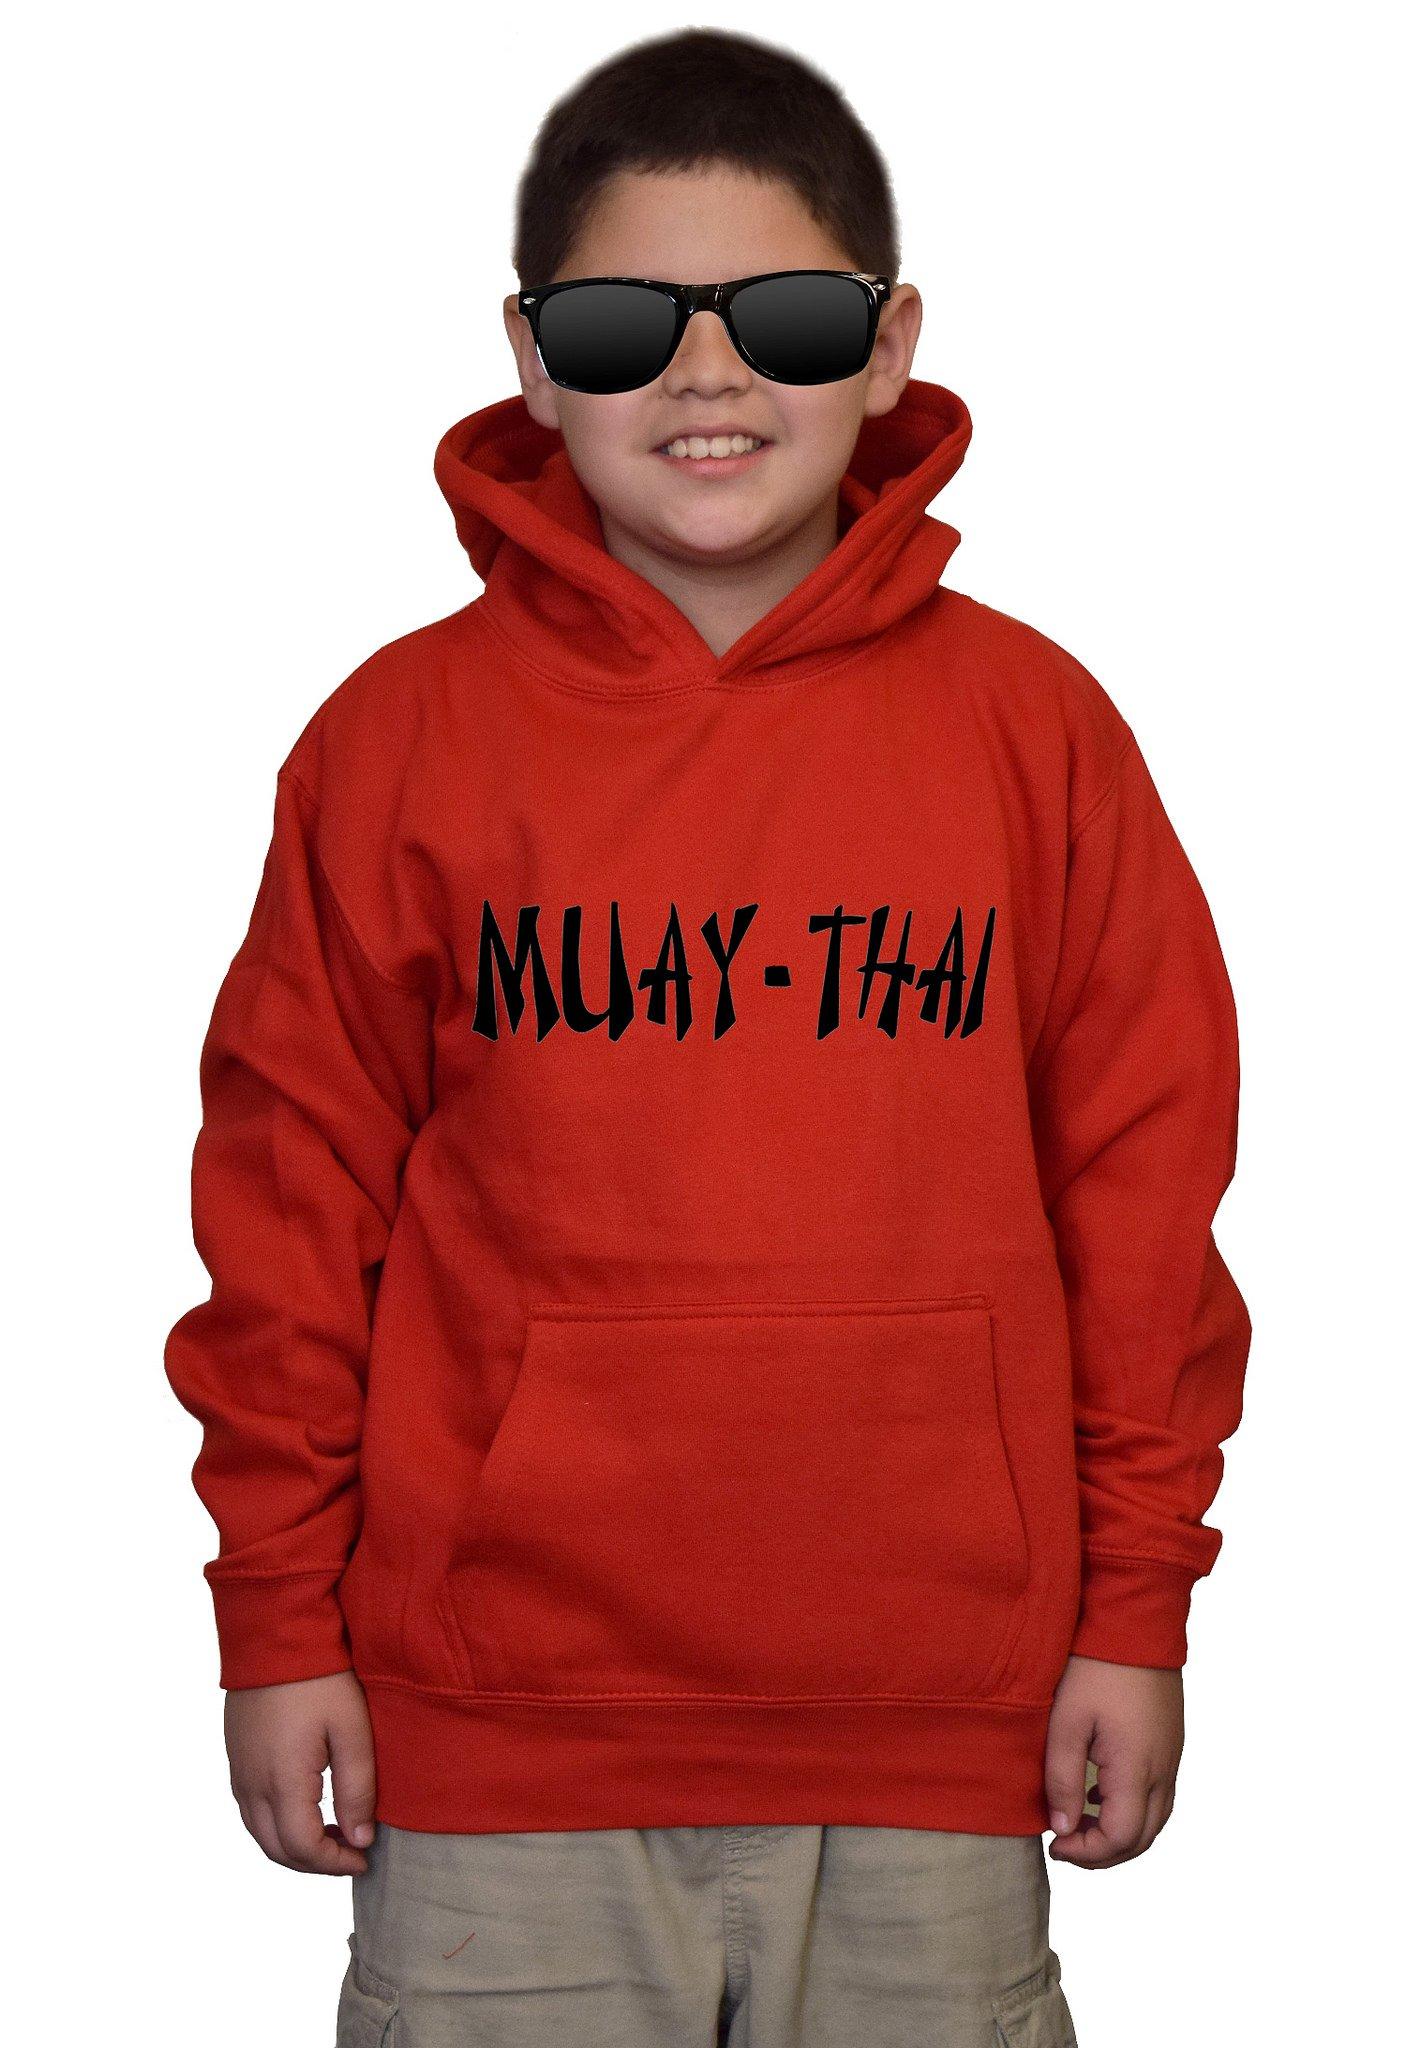 Youth Muay-Thai MMA V442 Red kids Sweatshirt Hoodie Large